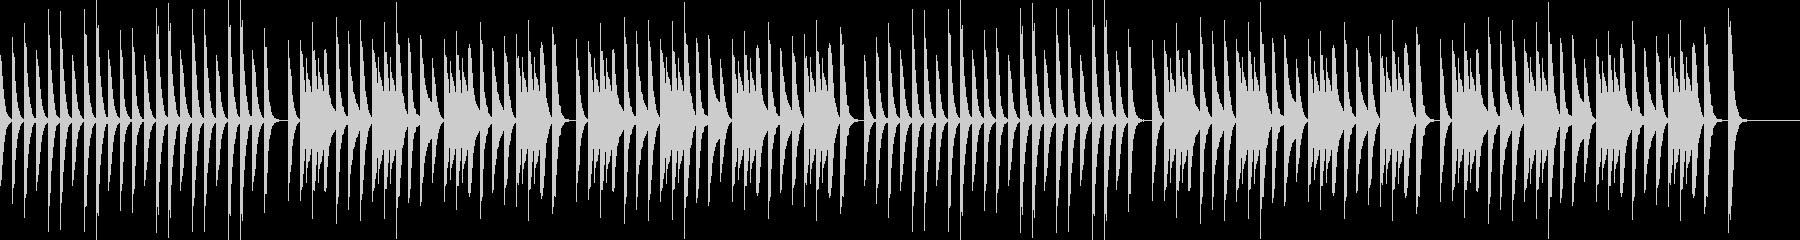 YouTube、コミカルなピアノ、日常の未再生の波形